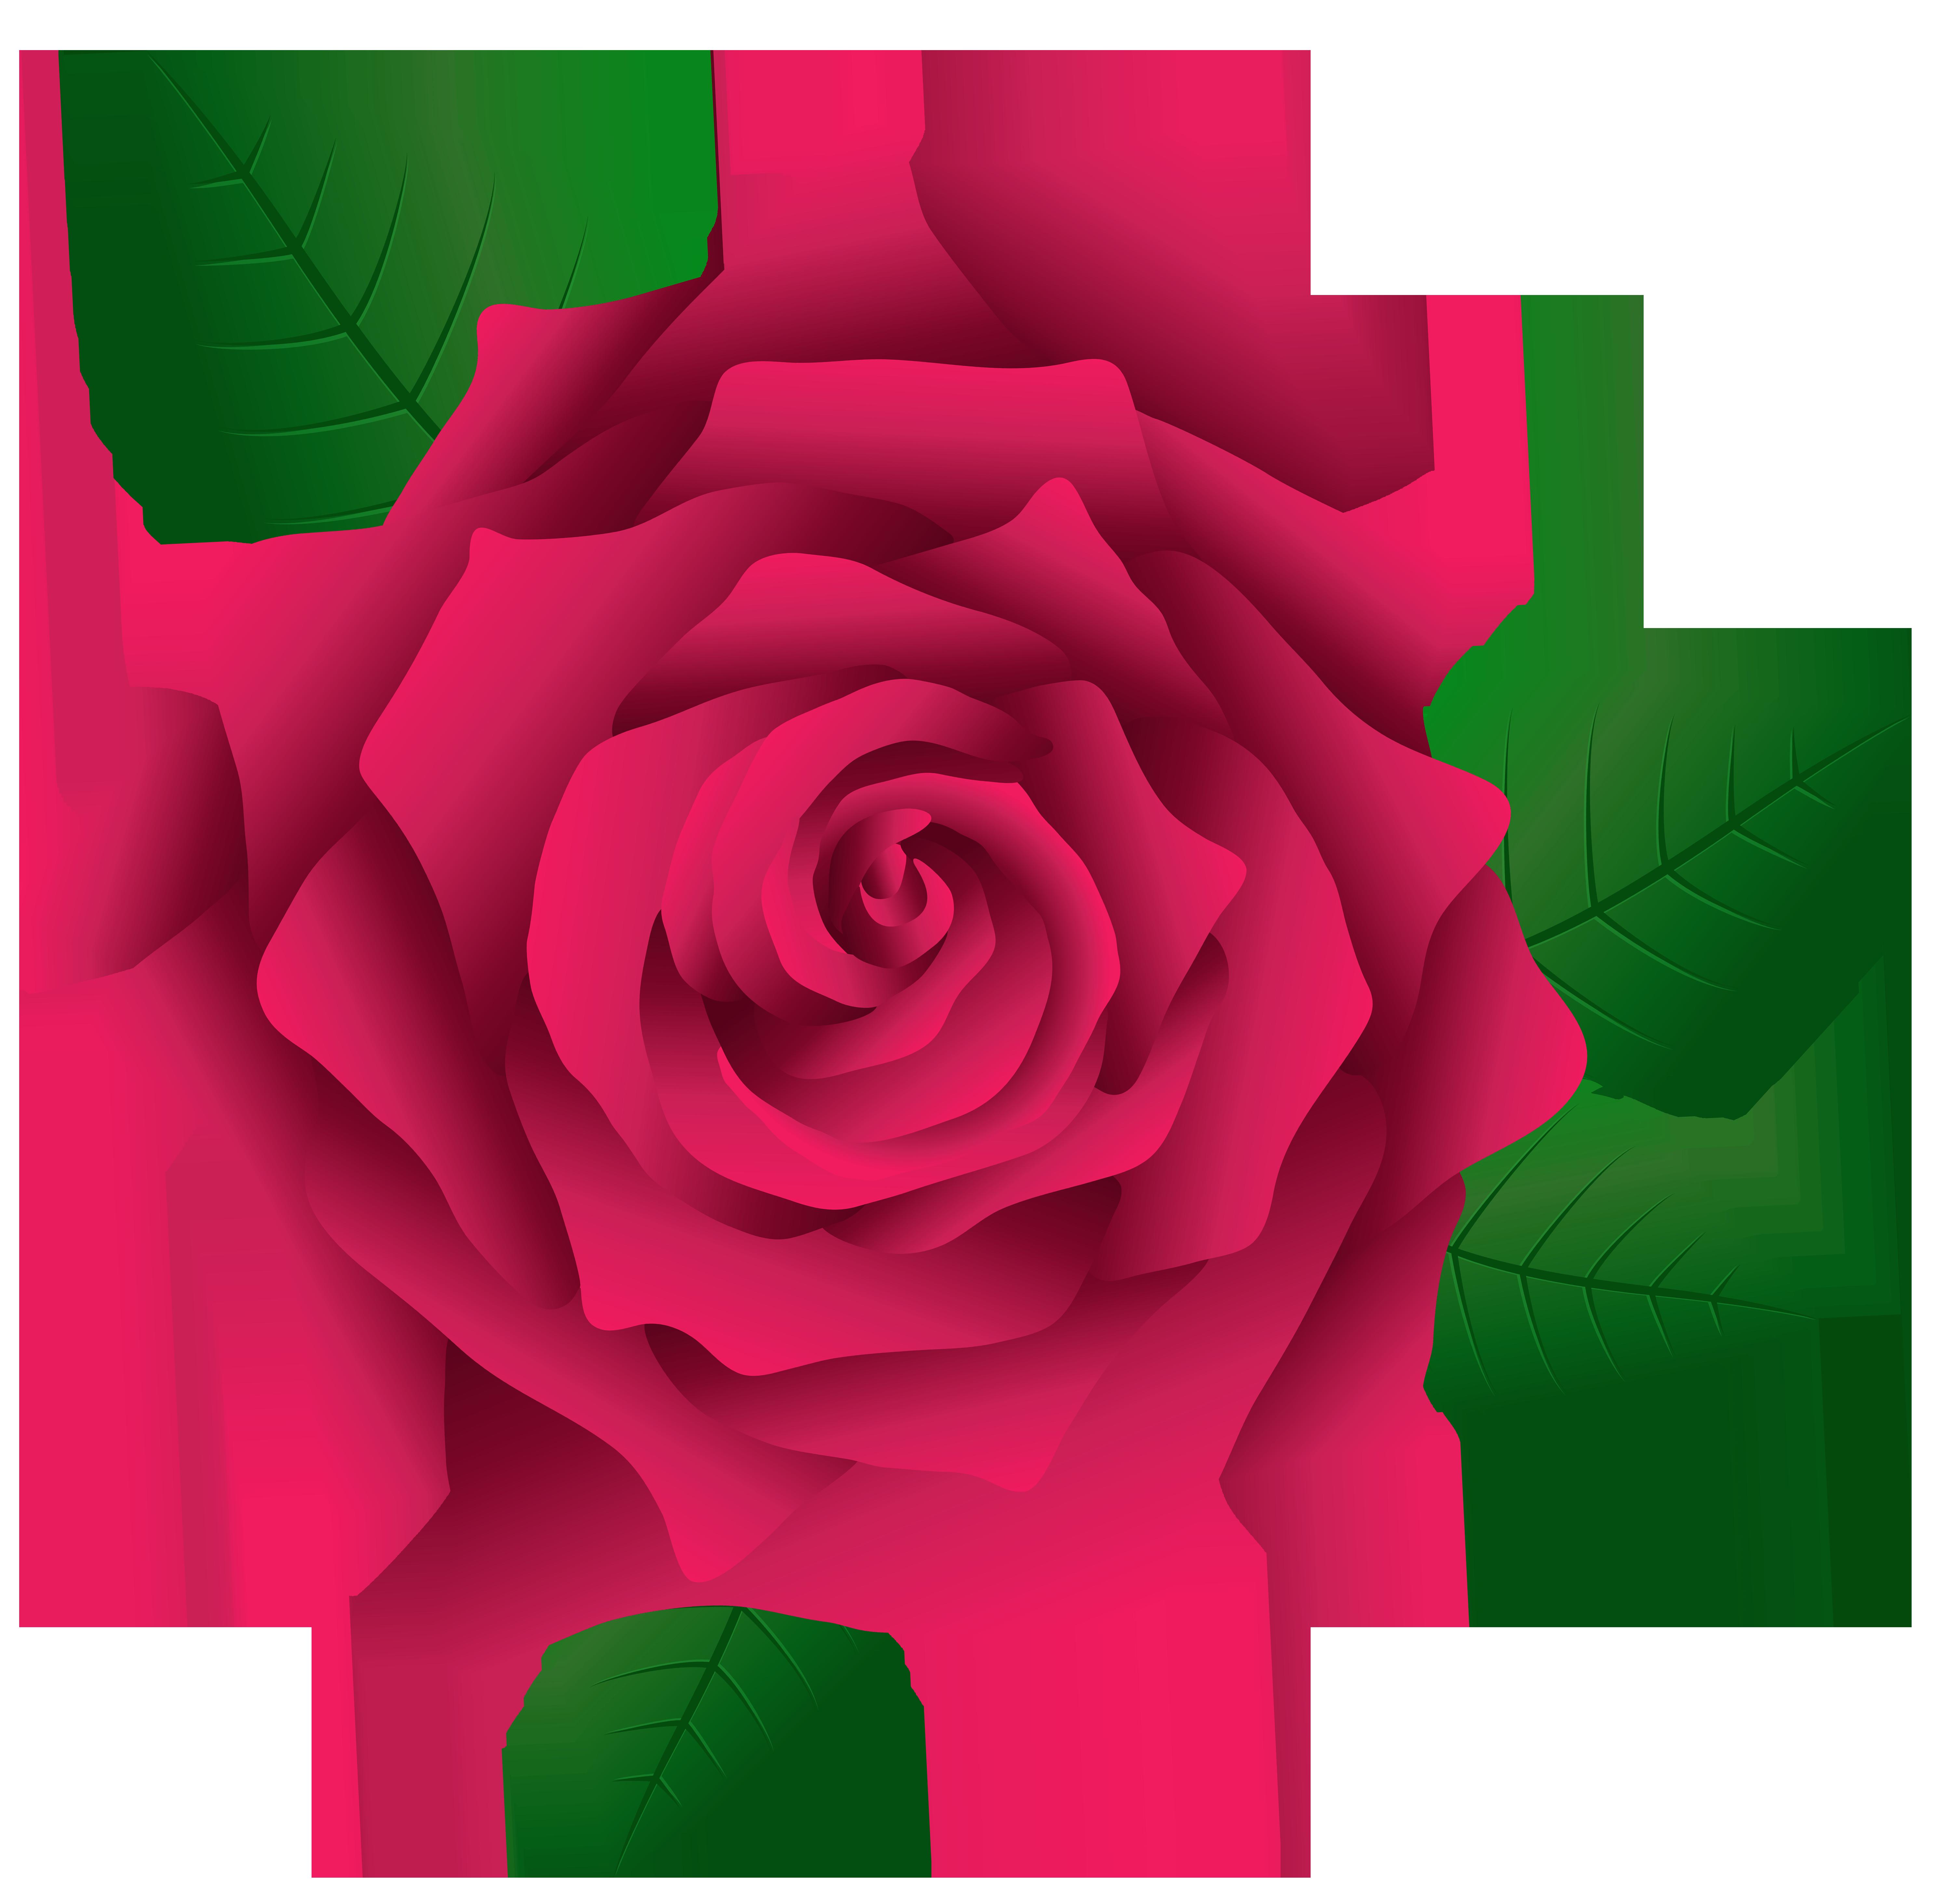 Rose clipart pink rose #7